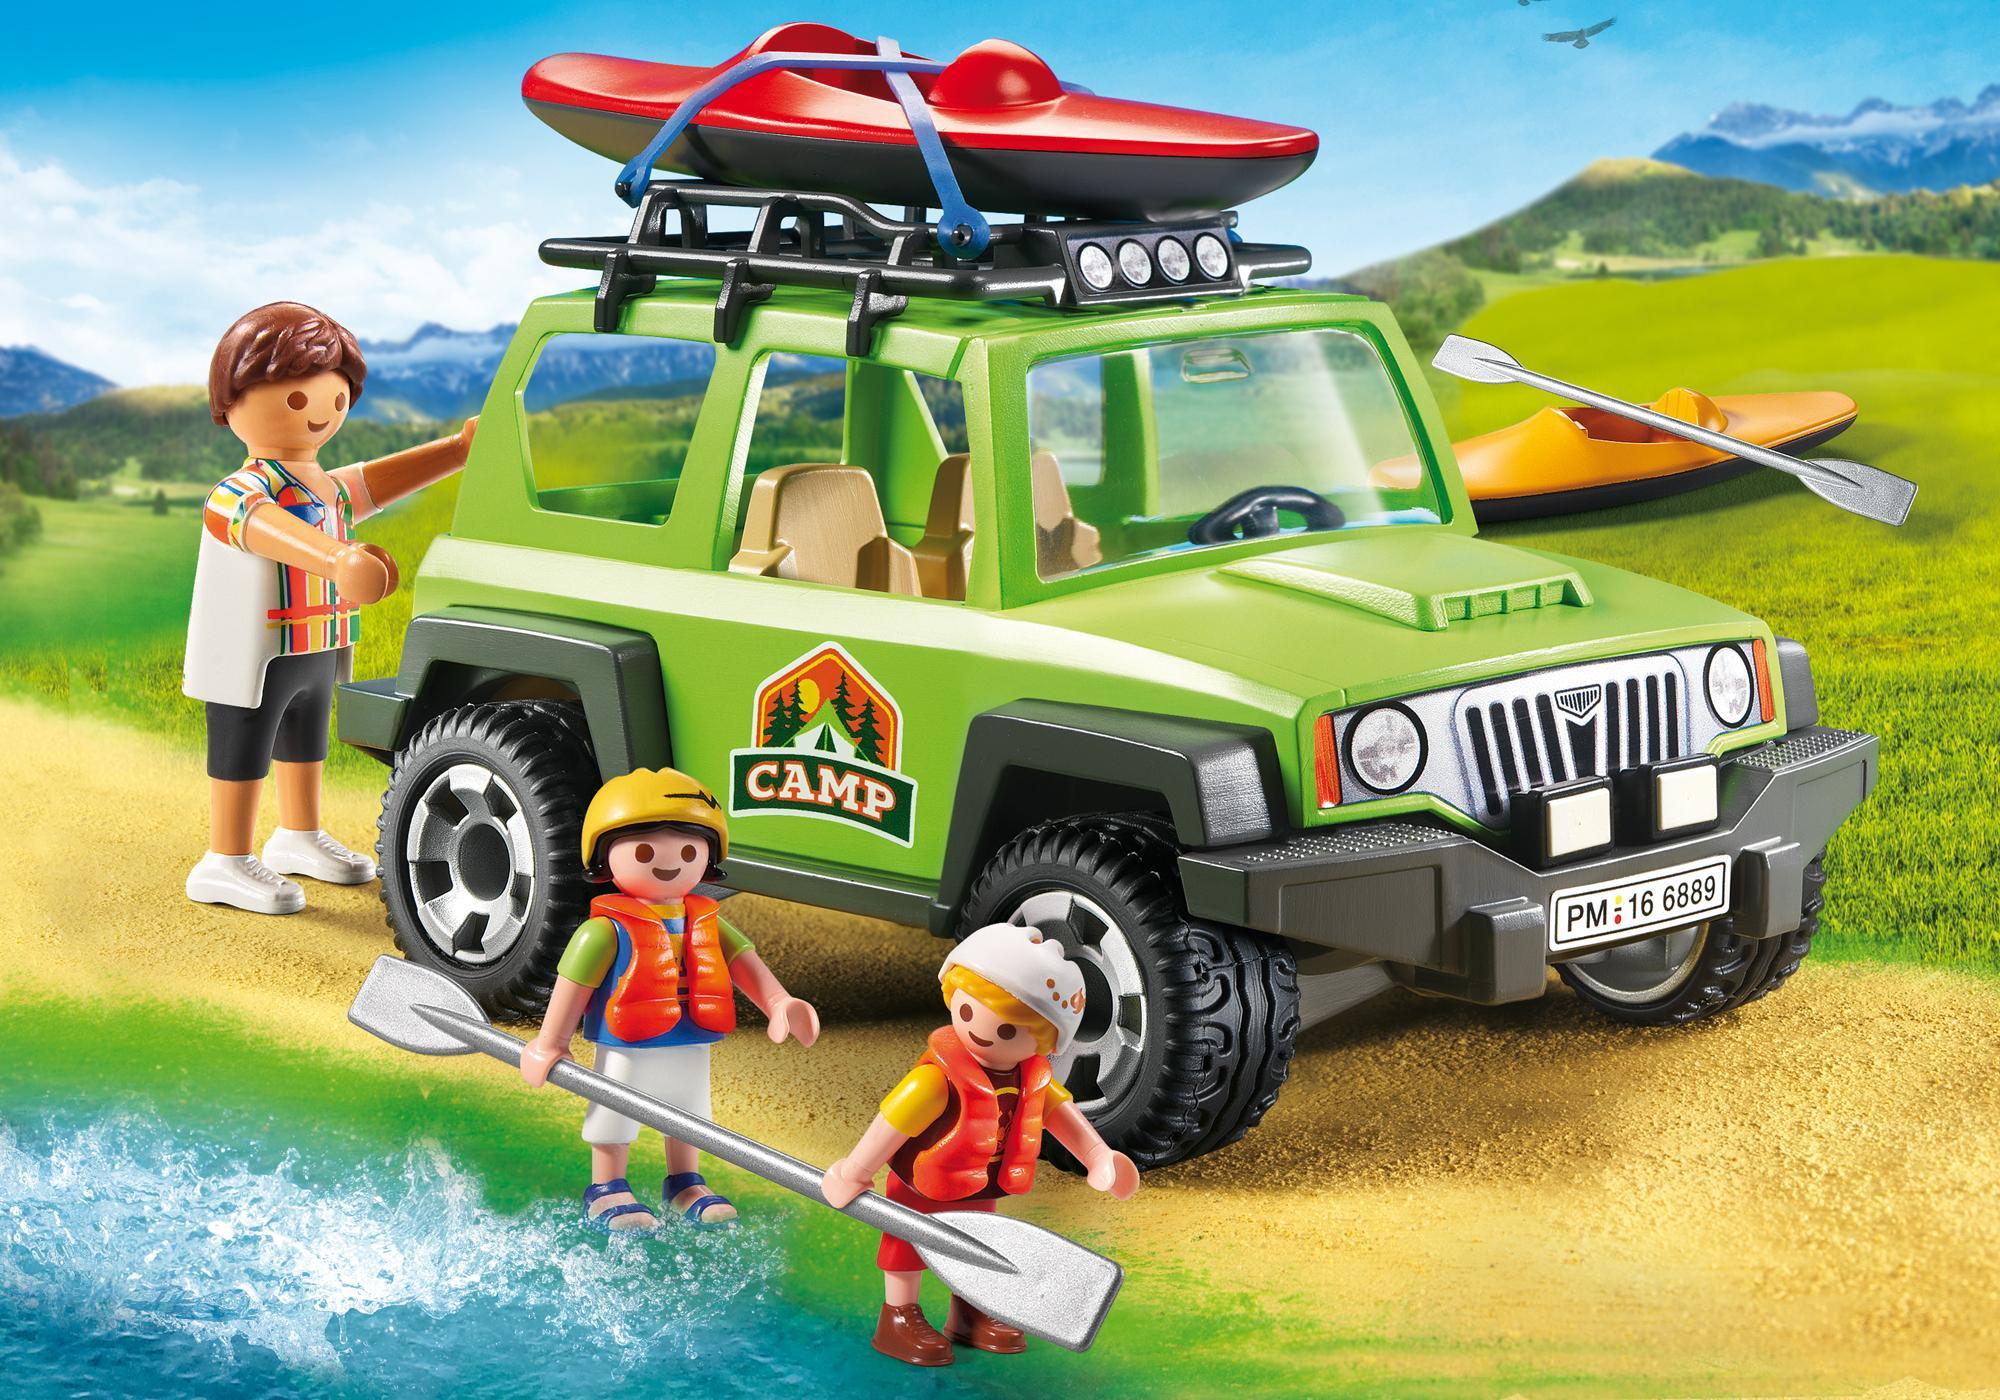 http://media.playmobil.com/i/playmobil/6889_product_detail